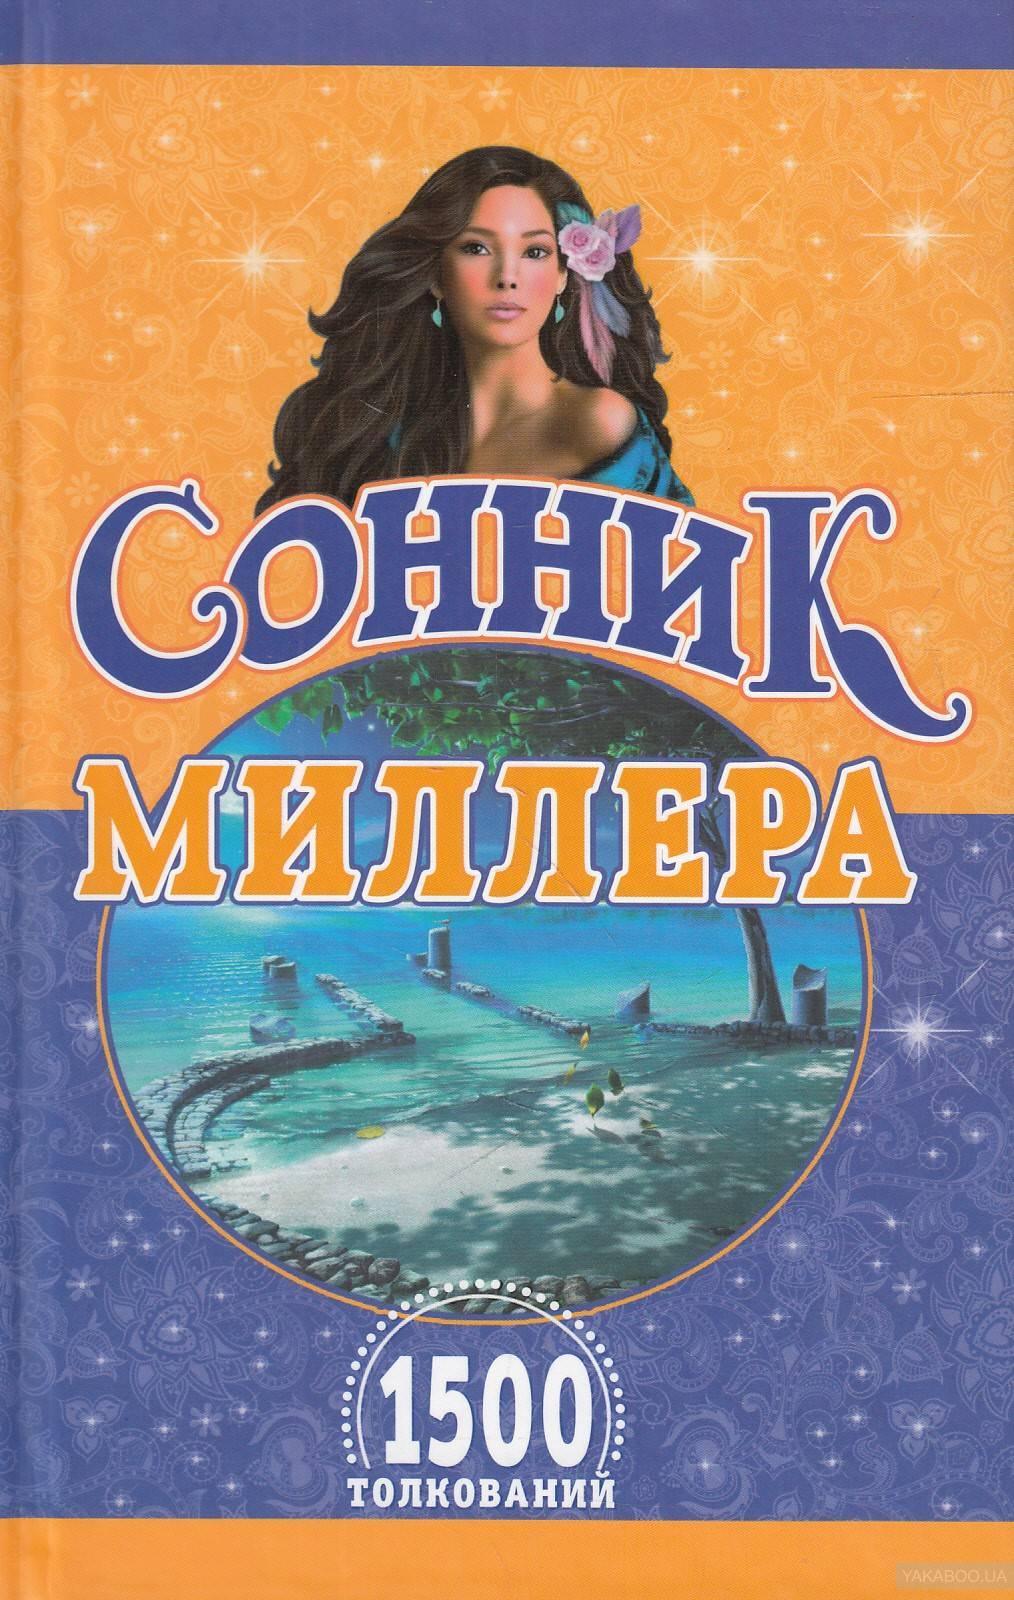 Сонник миллера - ц